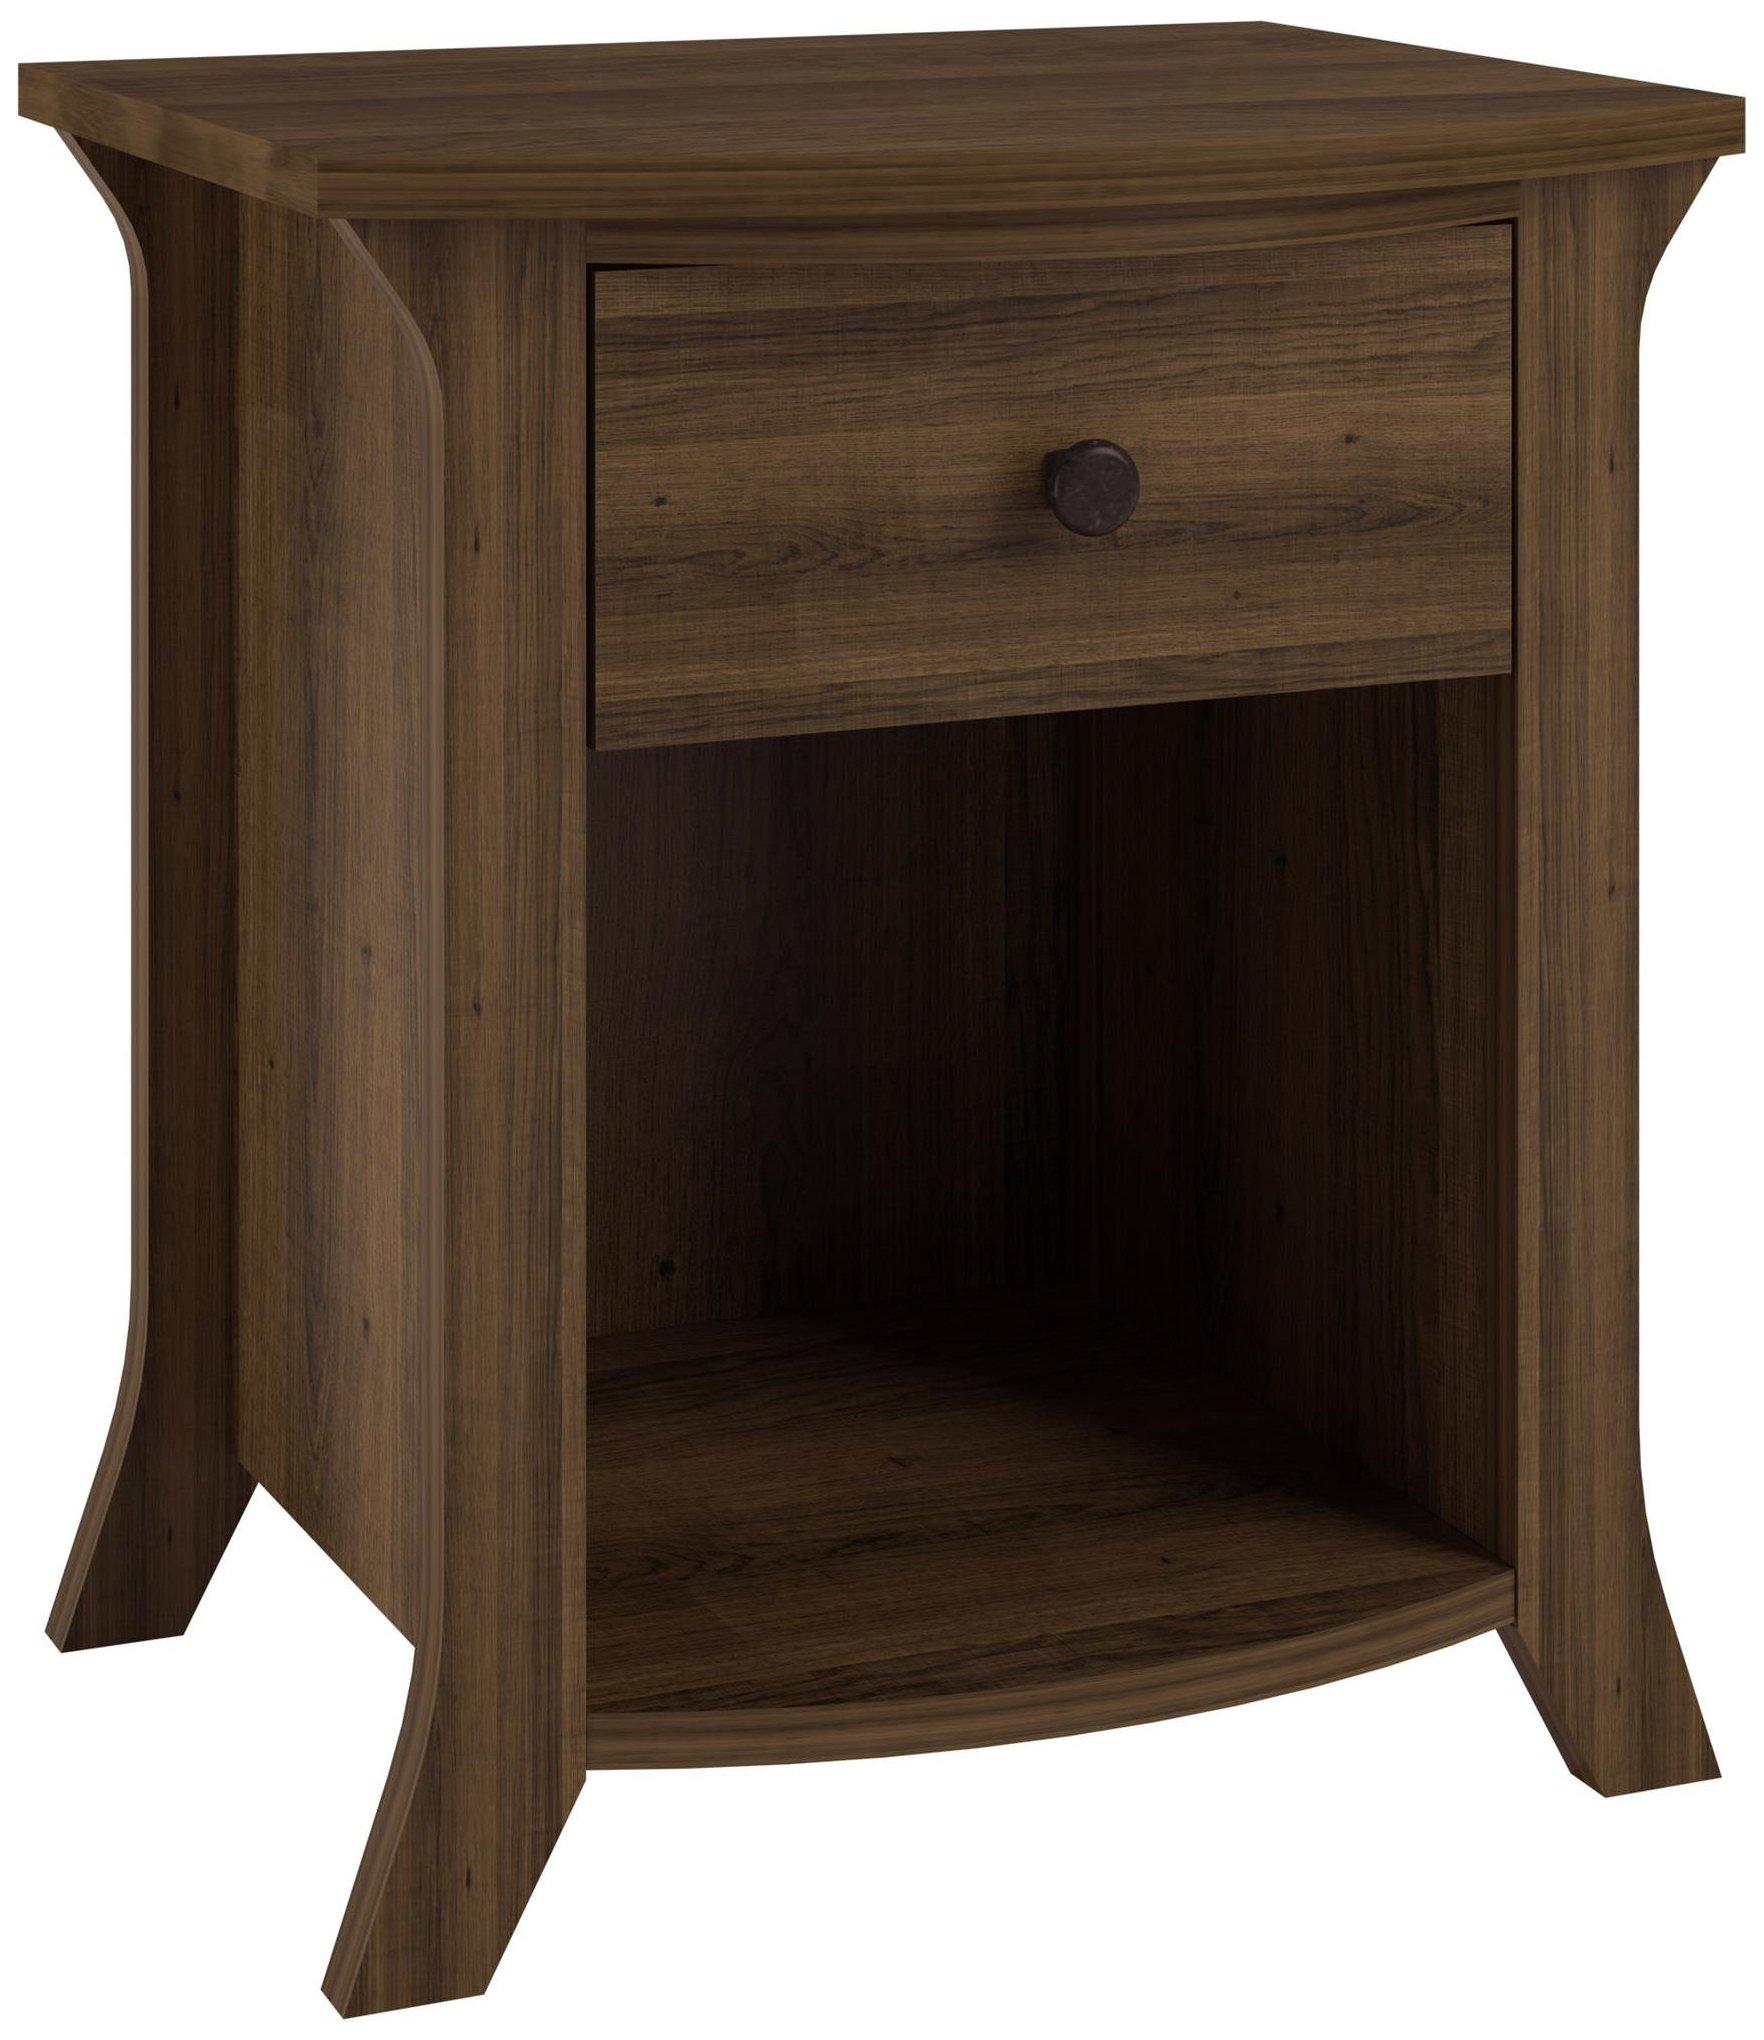 Altra Furniture Ameriwood Home Oakridge Accent Table, Brown Oak